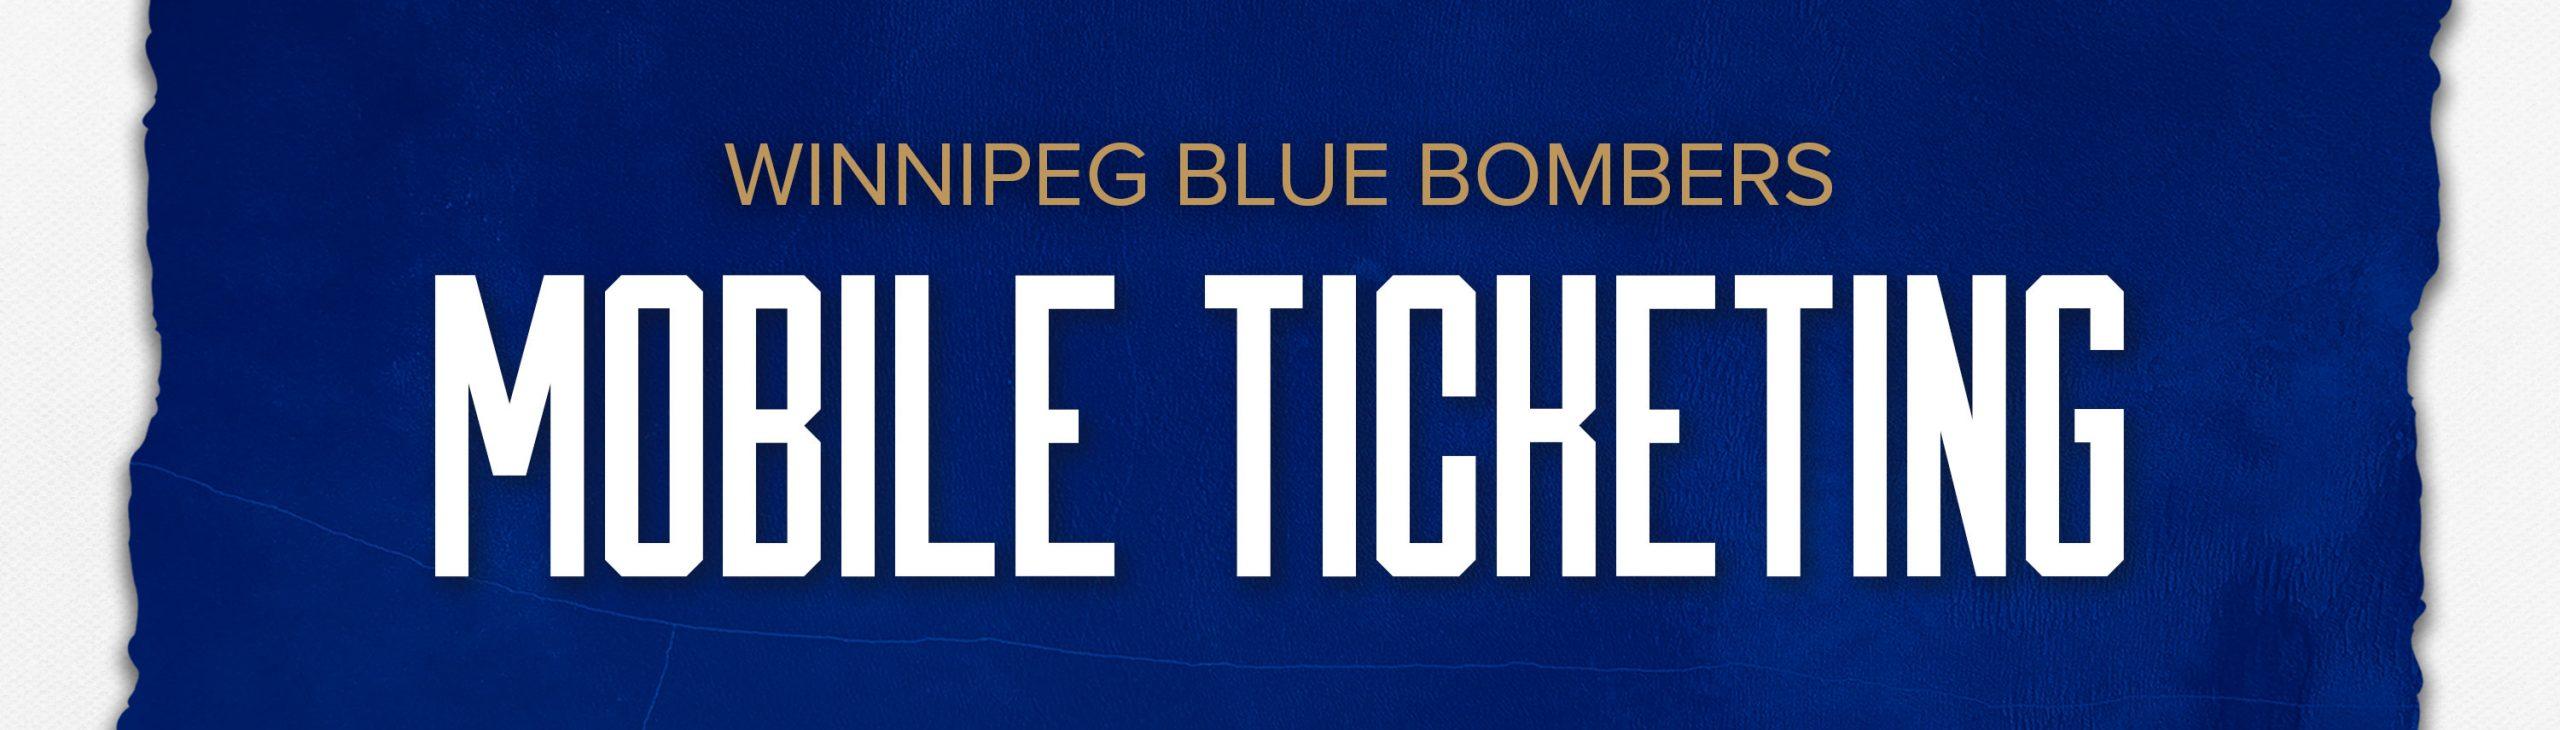 Winnipeg Blue Bombers Mobile Ticketing